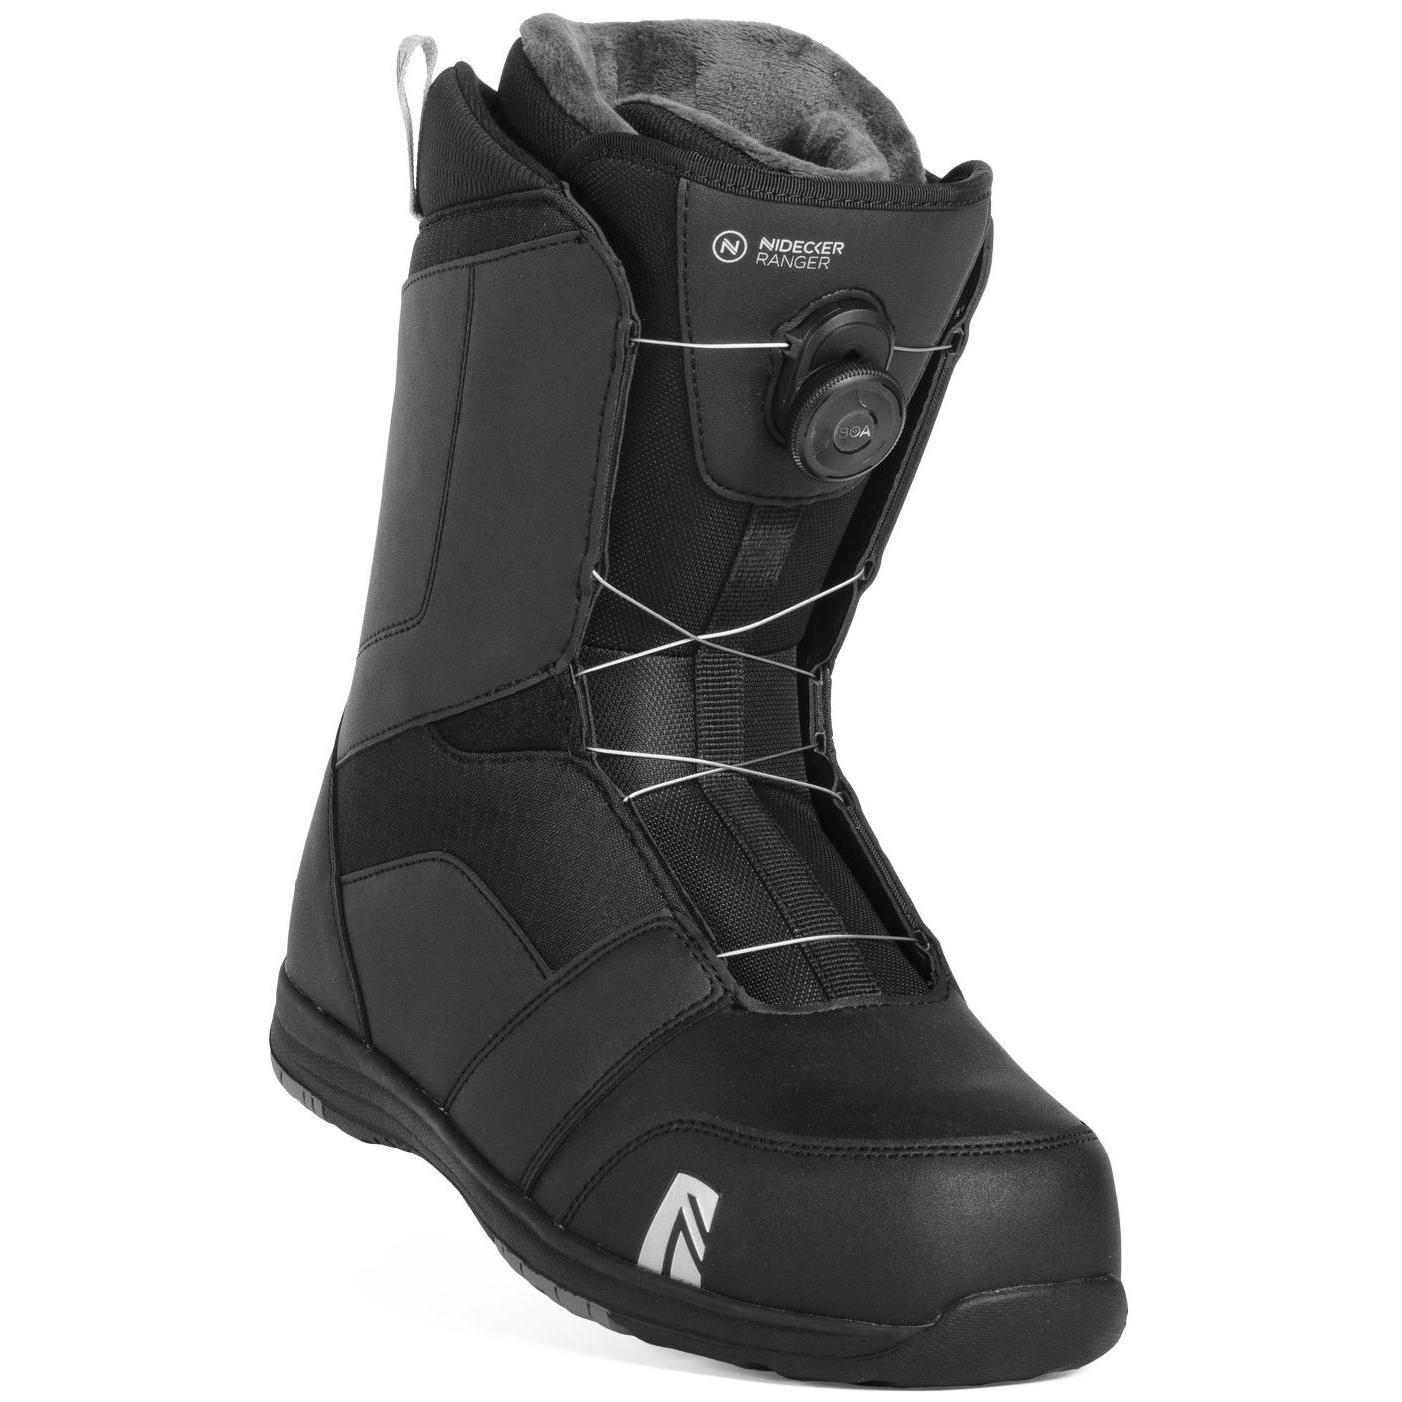 Ботинки для сноуборда Nidecker Ranger BOA 2019,